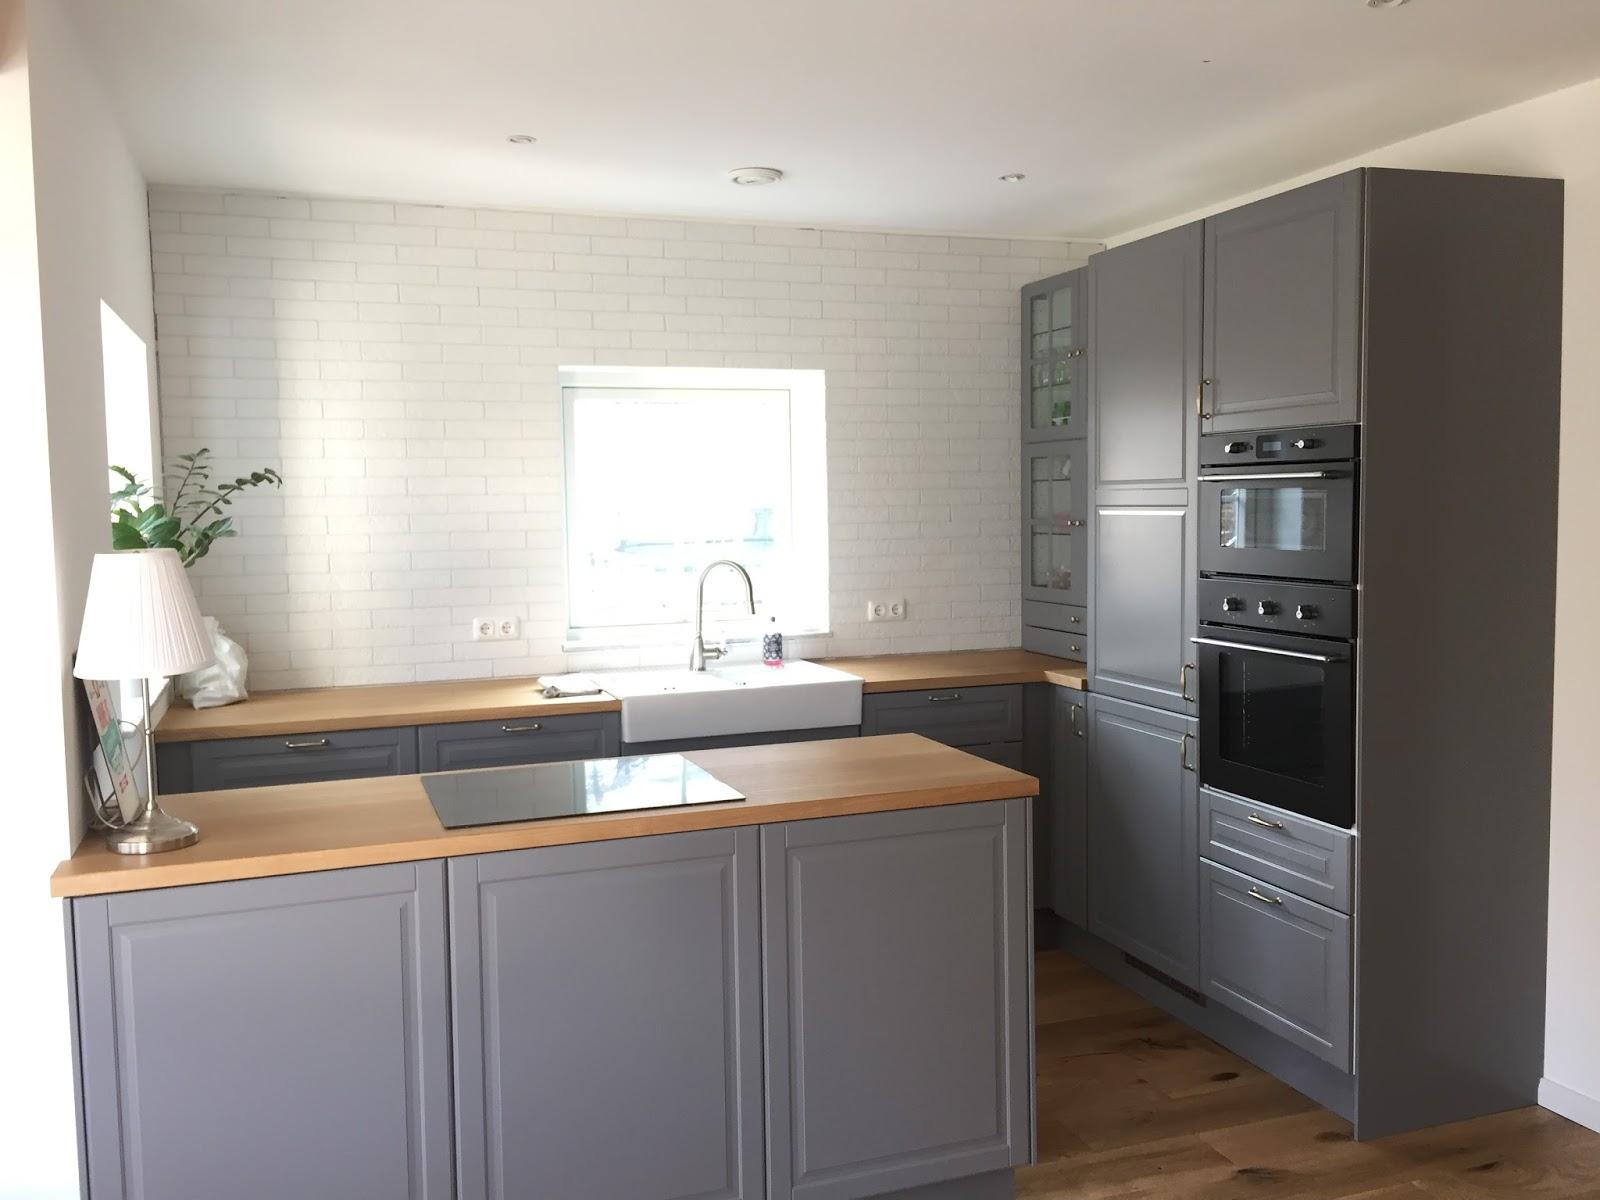 bodbyn k che grau k che h cker oder nolte k che kaufen. Black Bedroom Furniture Sets. Home Design Ideas